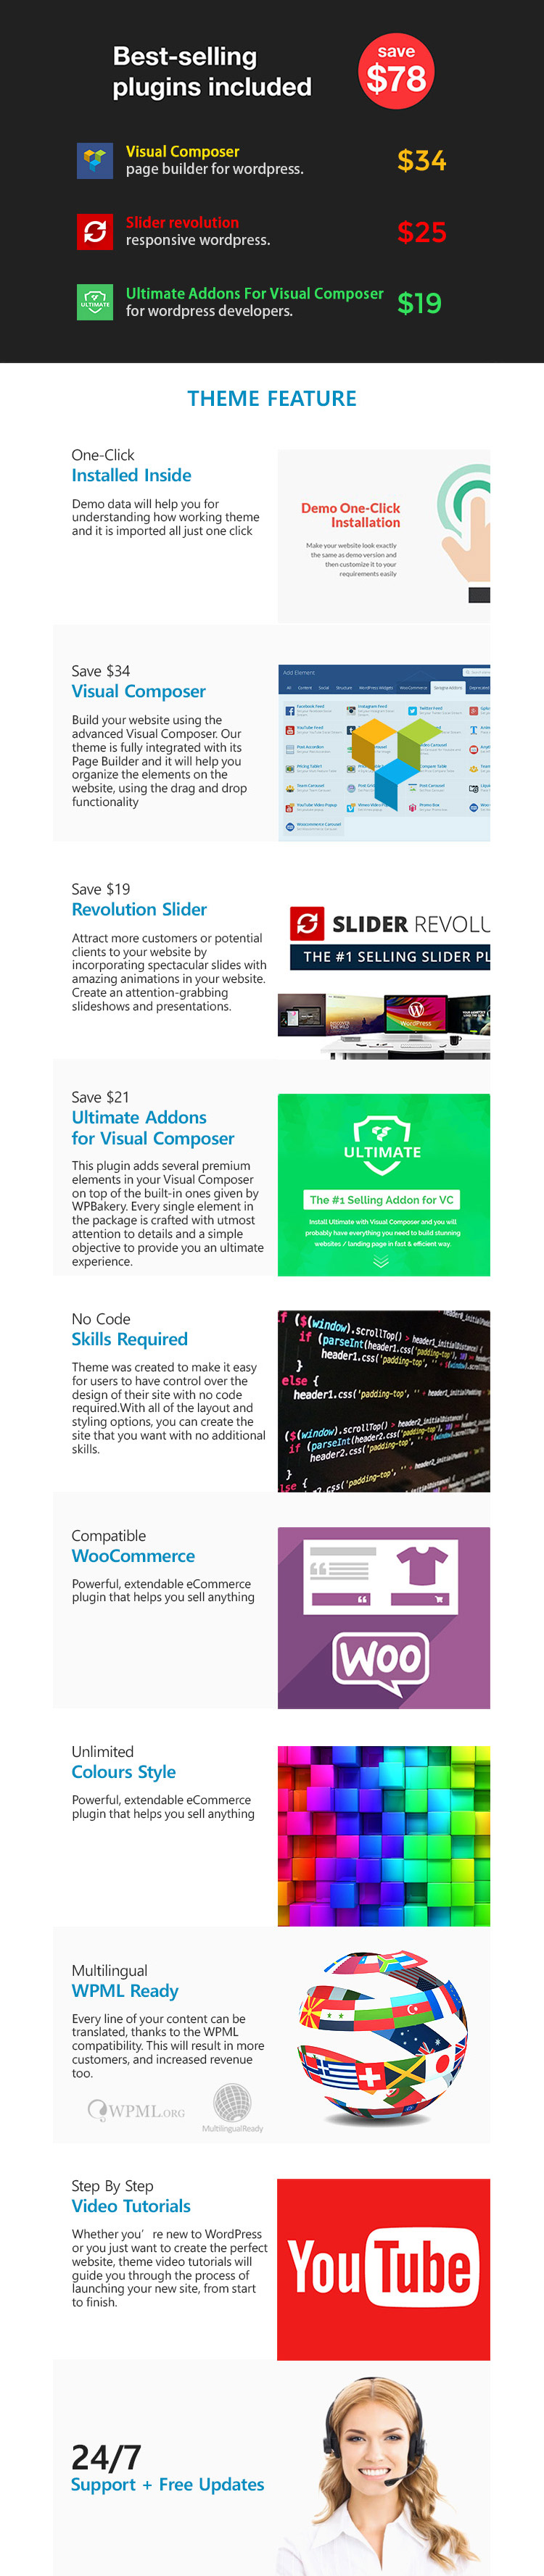 Construction WordPress theme features